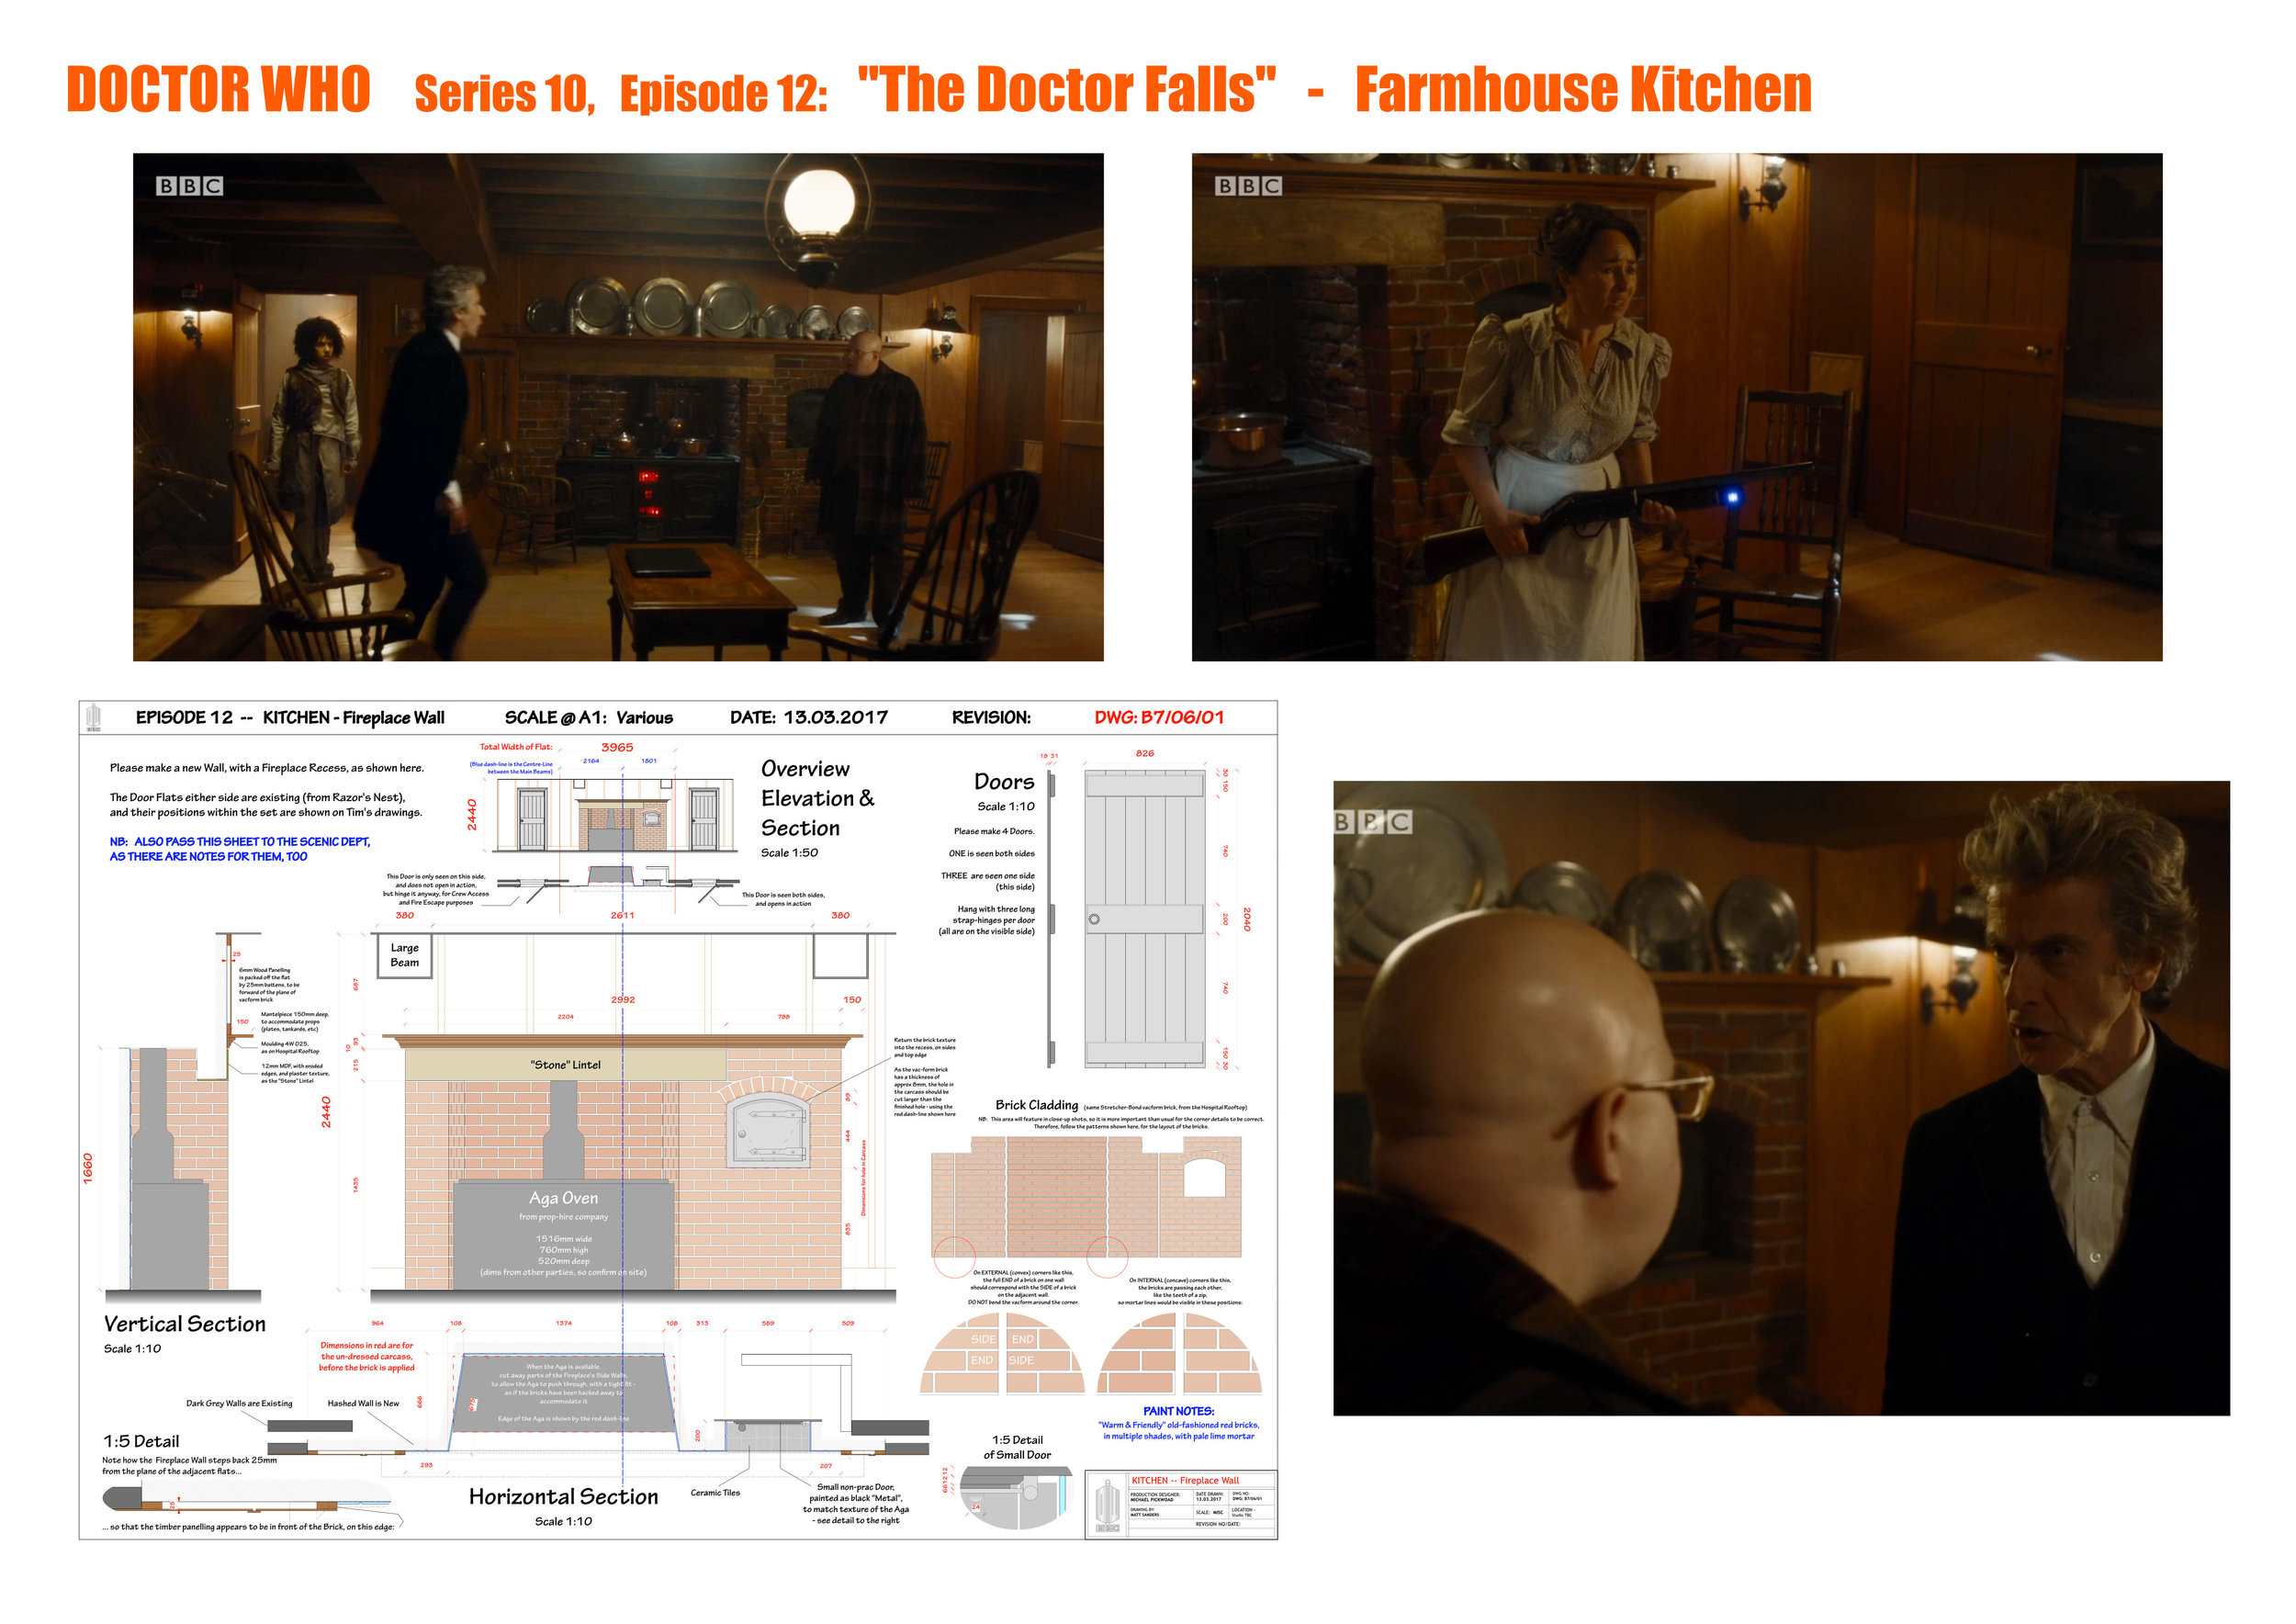 Ep 12 - The Doctor Falls - Farmhouse Kitchen.jpg